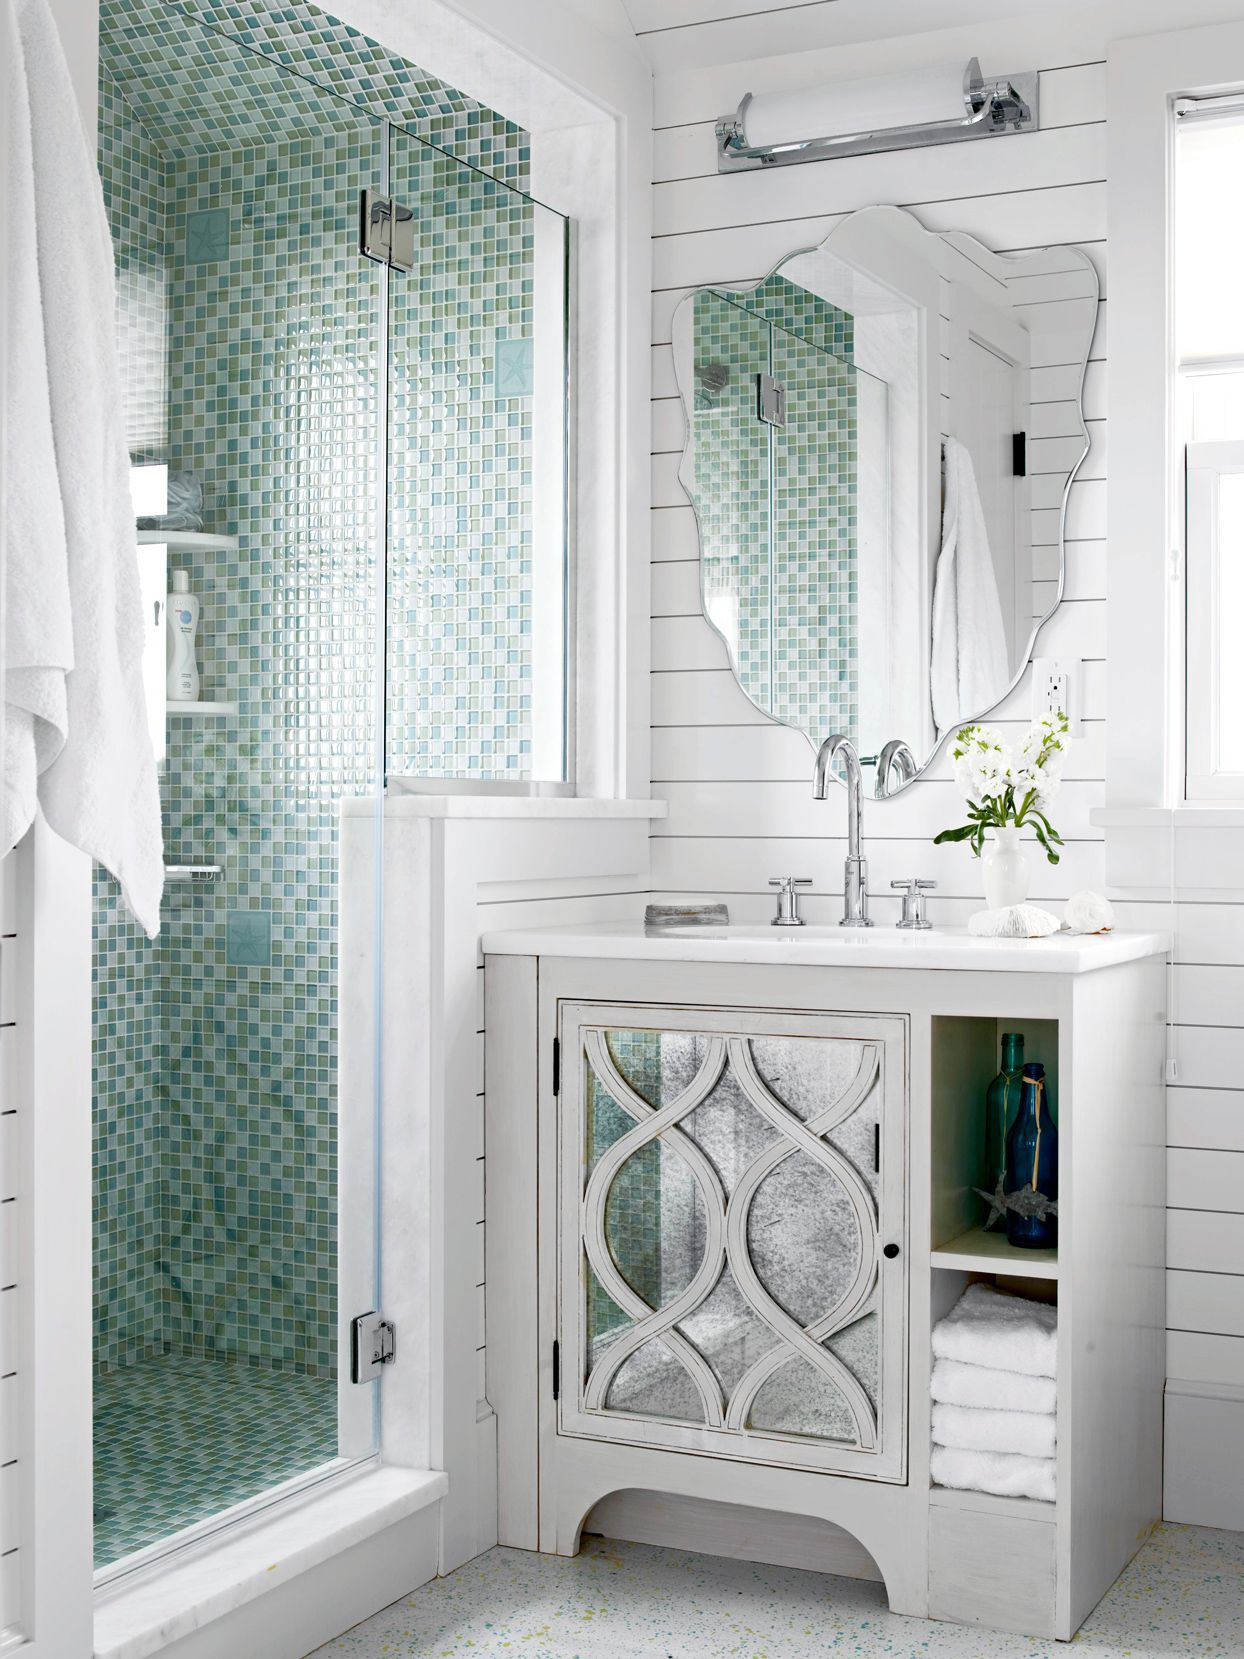 19 Small Bathroom Vanity Ideas That Pack In Plenty Of Storage In 2020 Small Bathroom Vanities Bathroom Remodel Designs Minimalist Small Bathrooms